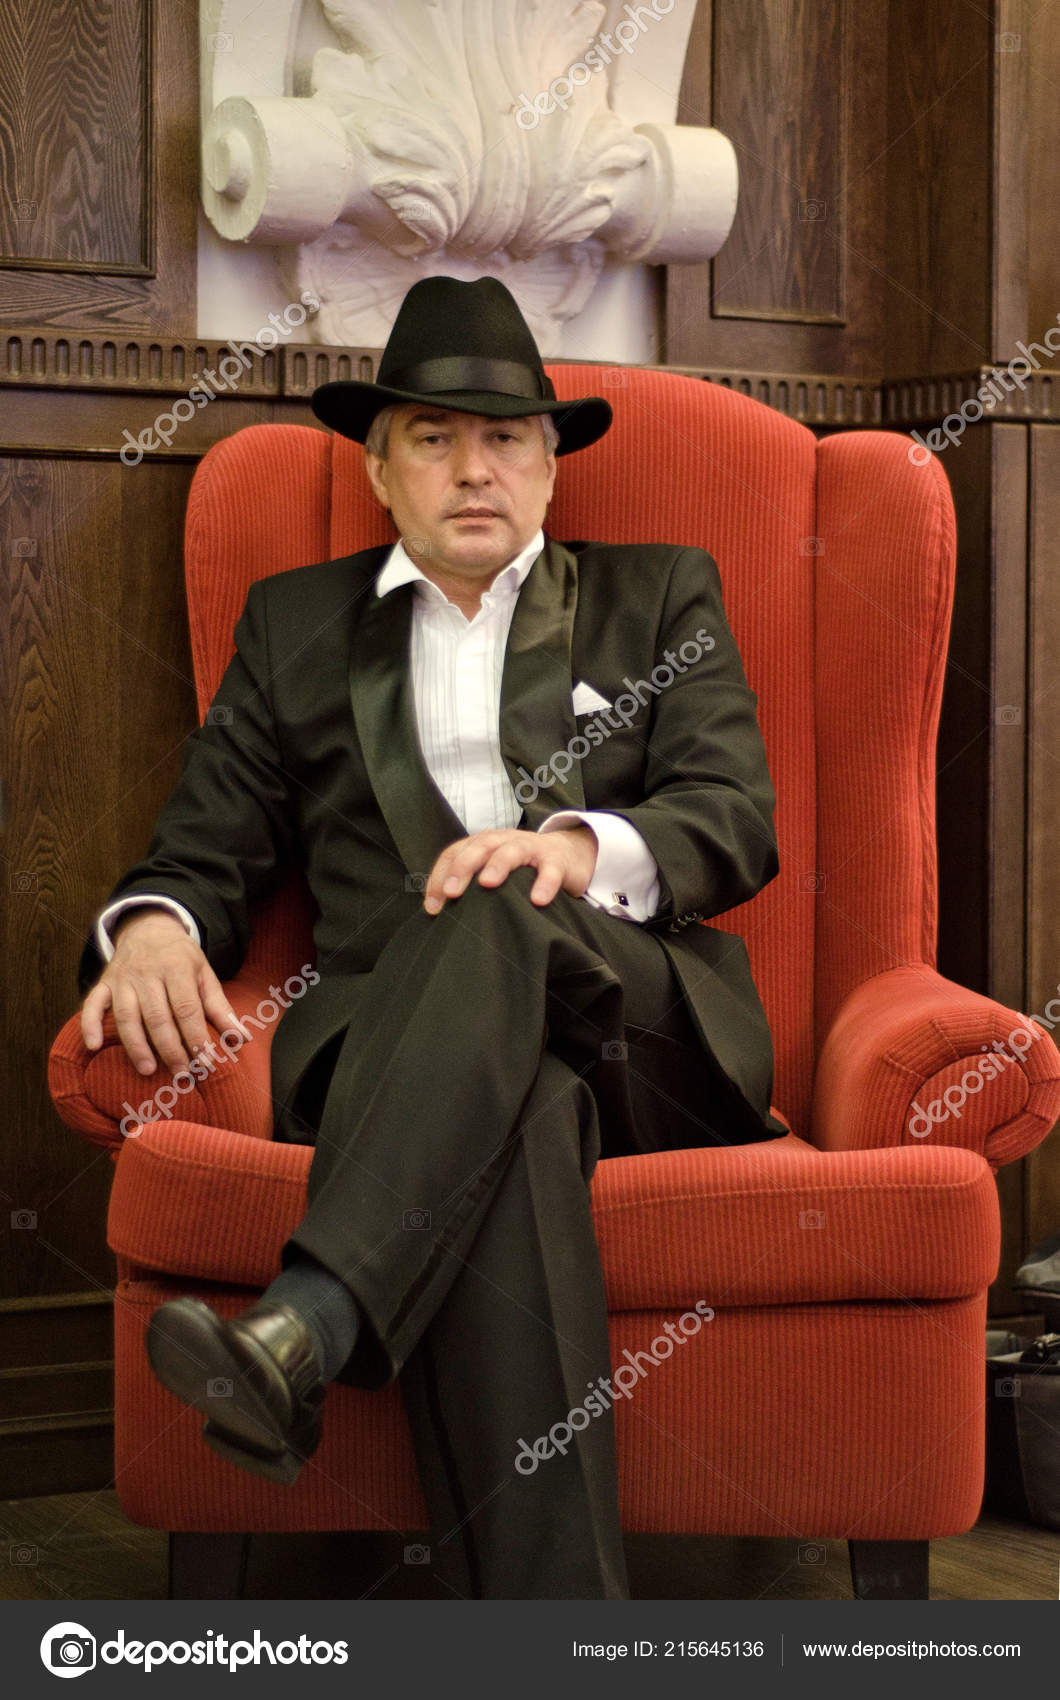 22001102138 Šedá vlasy starší gangster v interiéru. Šedá vlasy starší mafián na sobě  černý oblek a klobouk sedí v červené křeslo starého interiéru — Fotografie  od ...